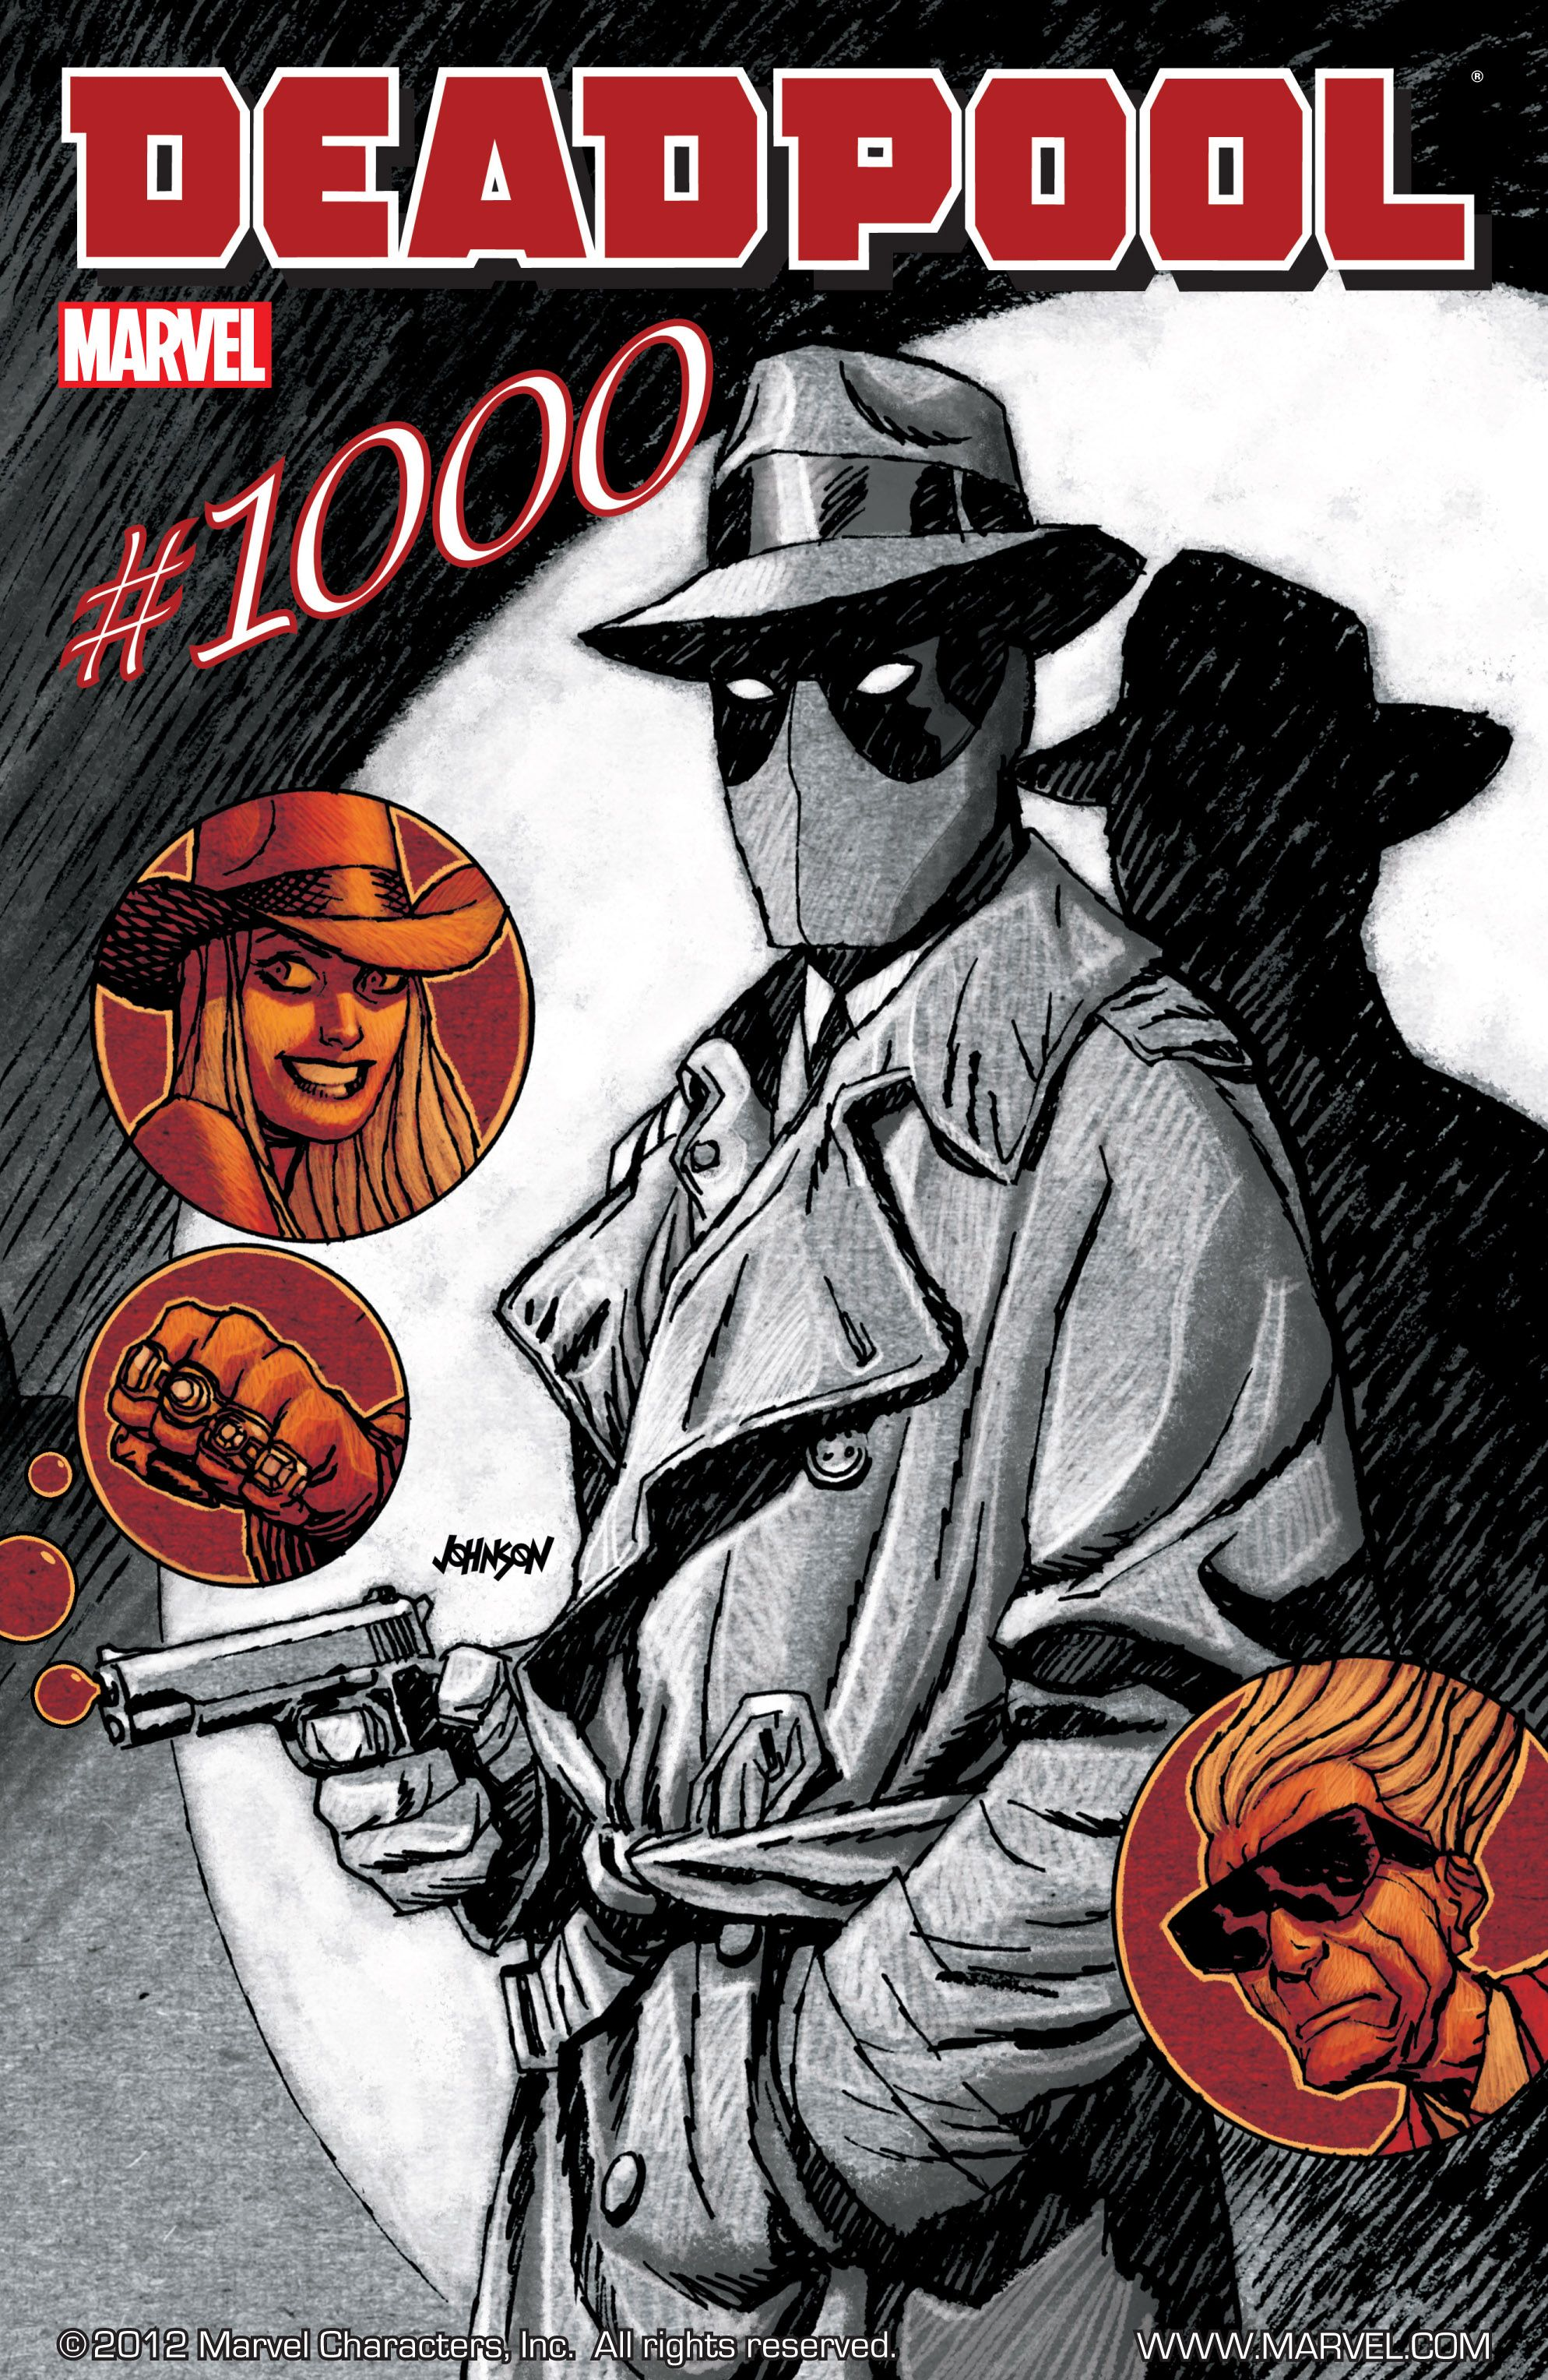 Deadpool (2008) 1000 Page 1